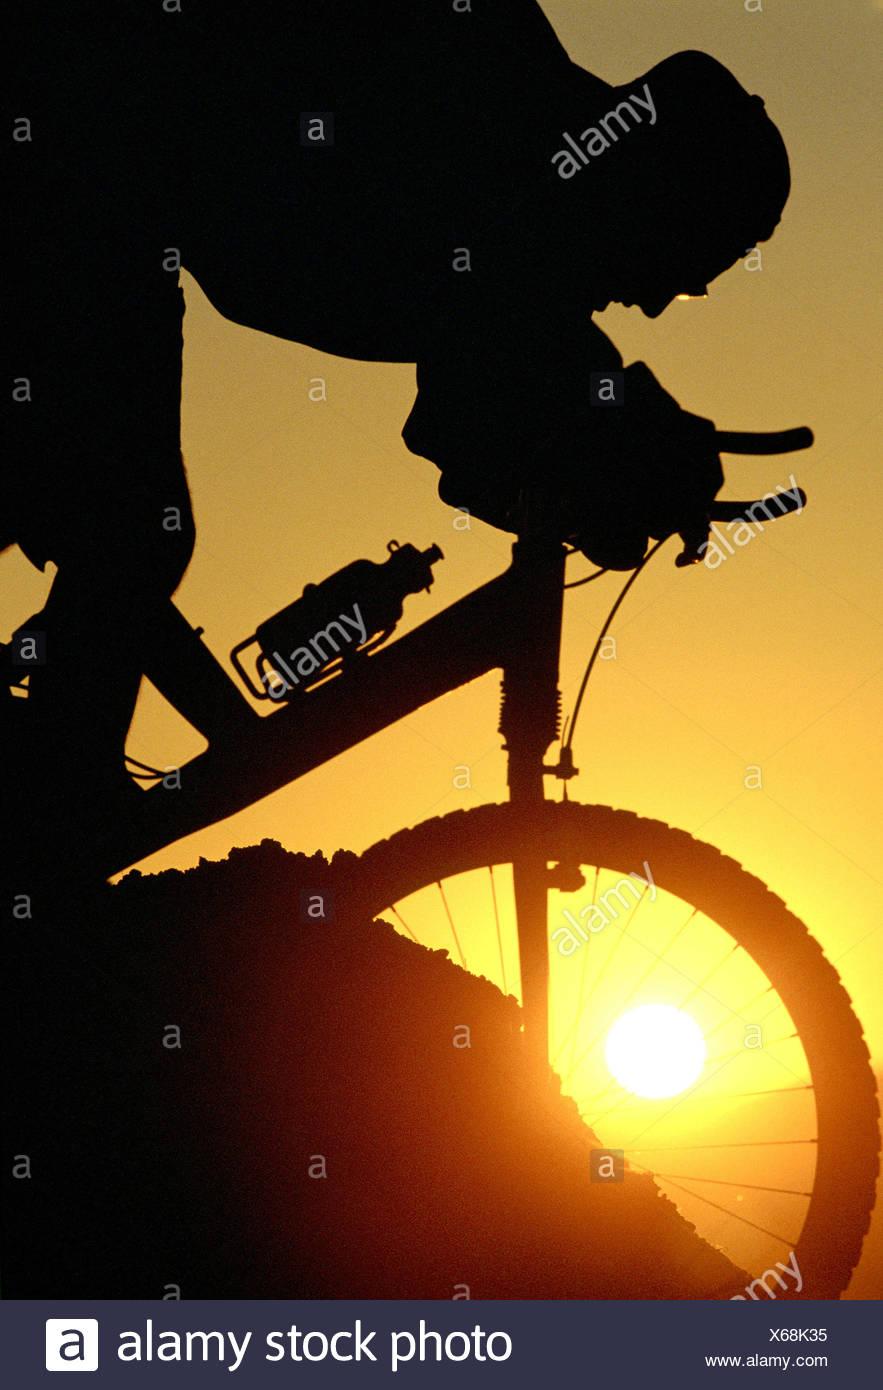 Silhouette of person mountain biking - Stock Image